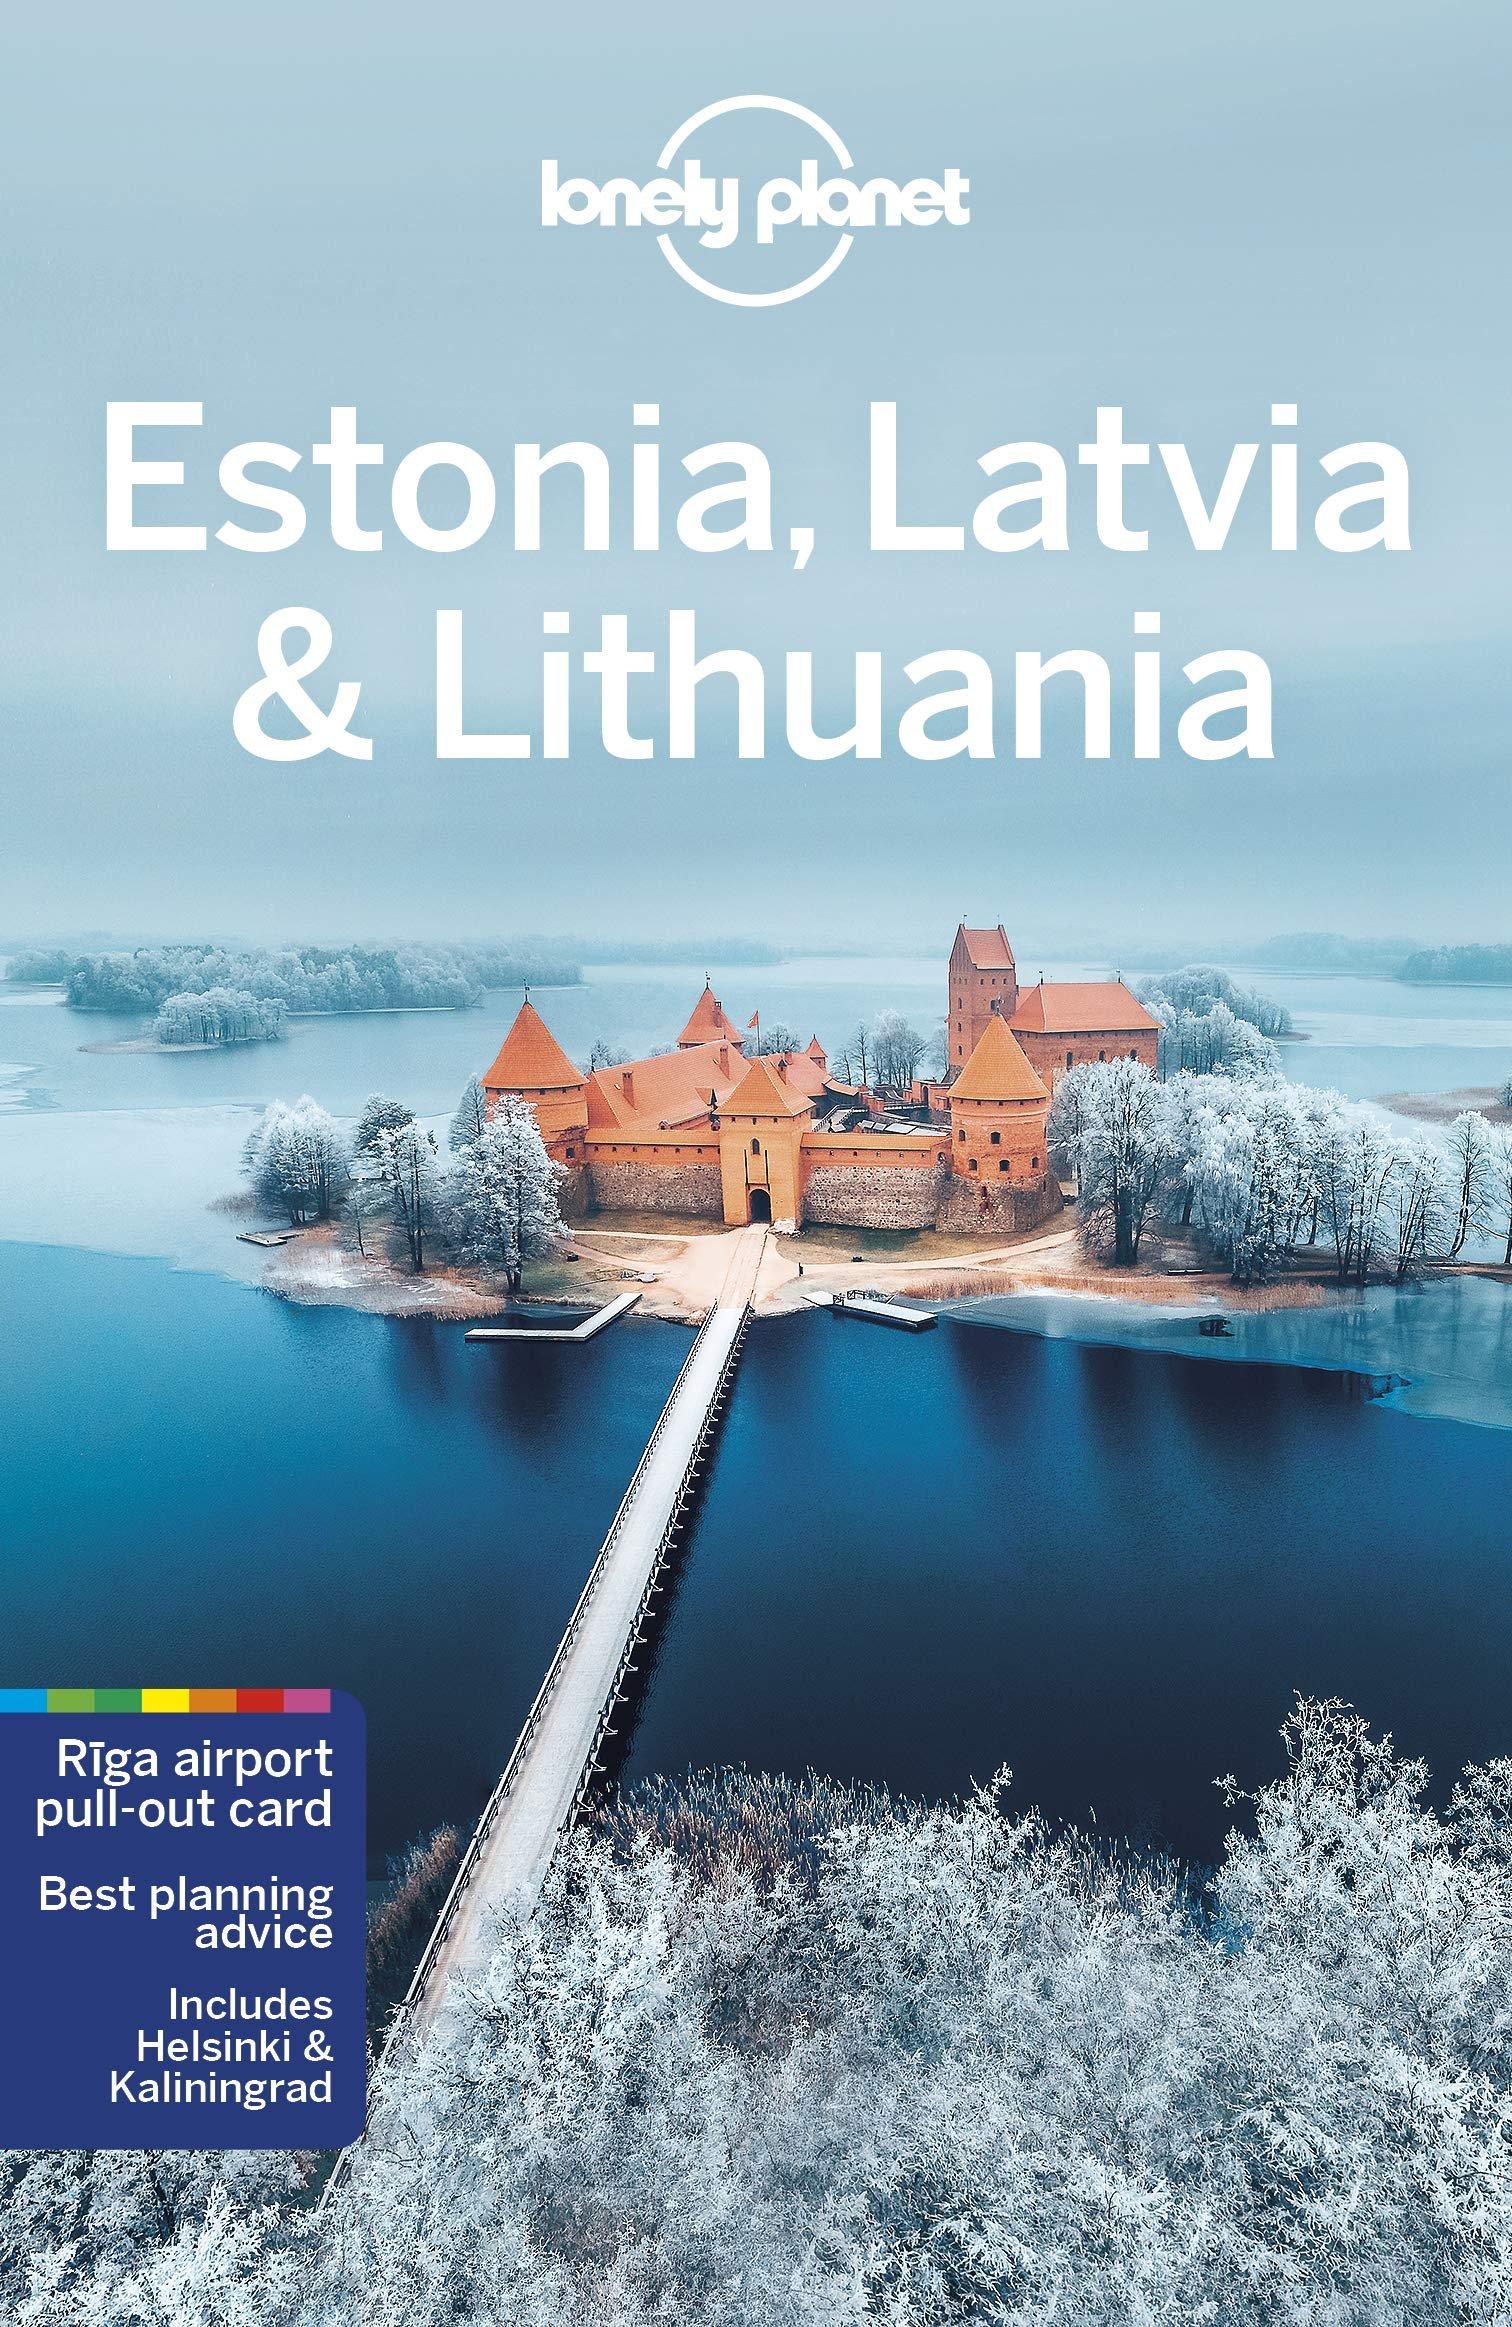 Lonely Planet Estonia, Latvia + Lithuania 9781786575982  Lonely Planet Travel Guides  Reisgidsen Baltische Staten en Kaliningrad